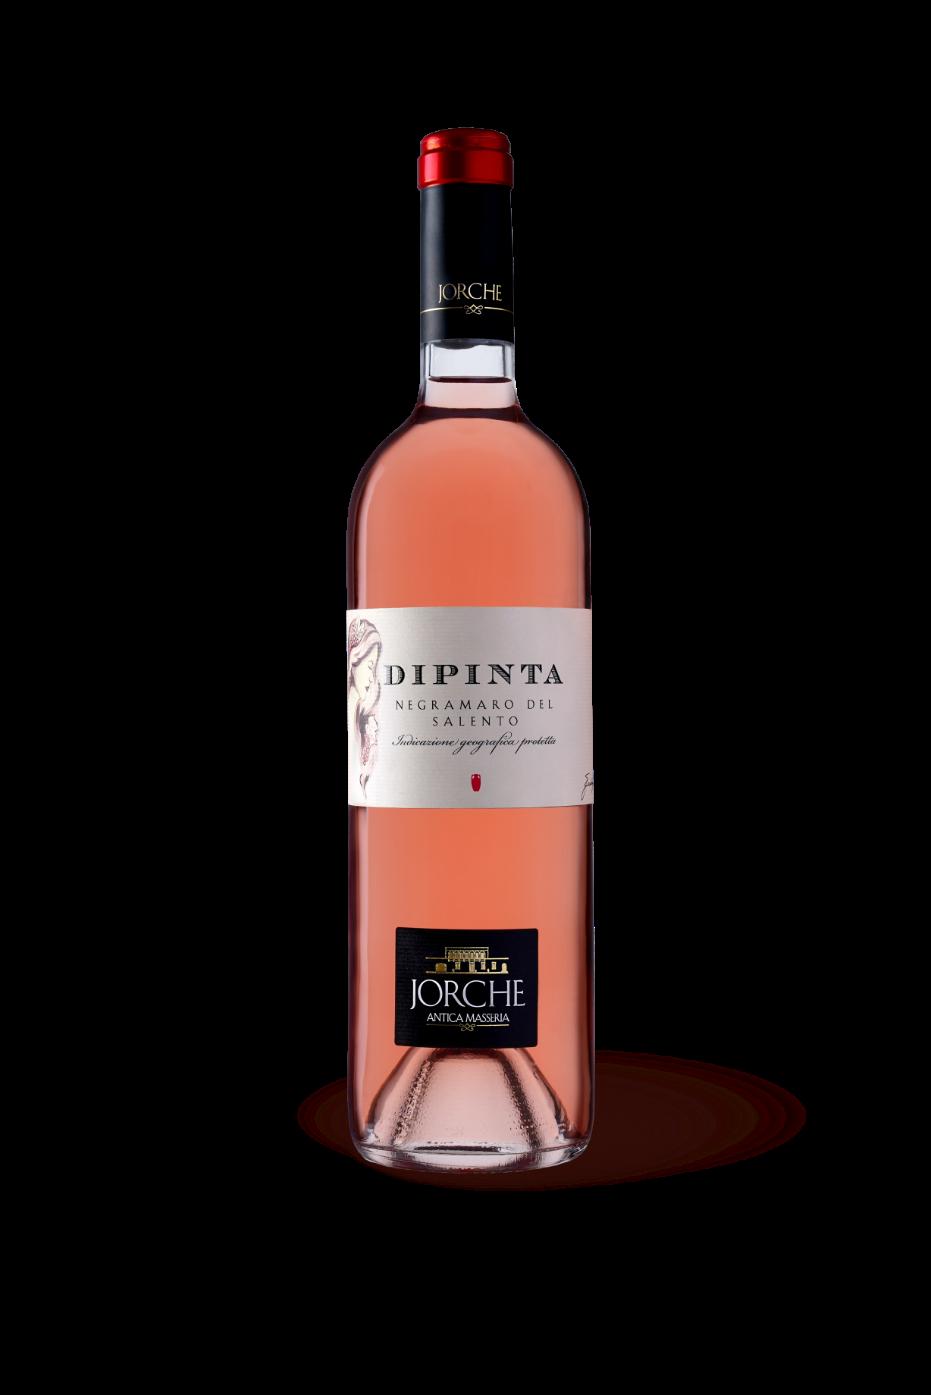 Dipinta 2019 Jorche winery